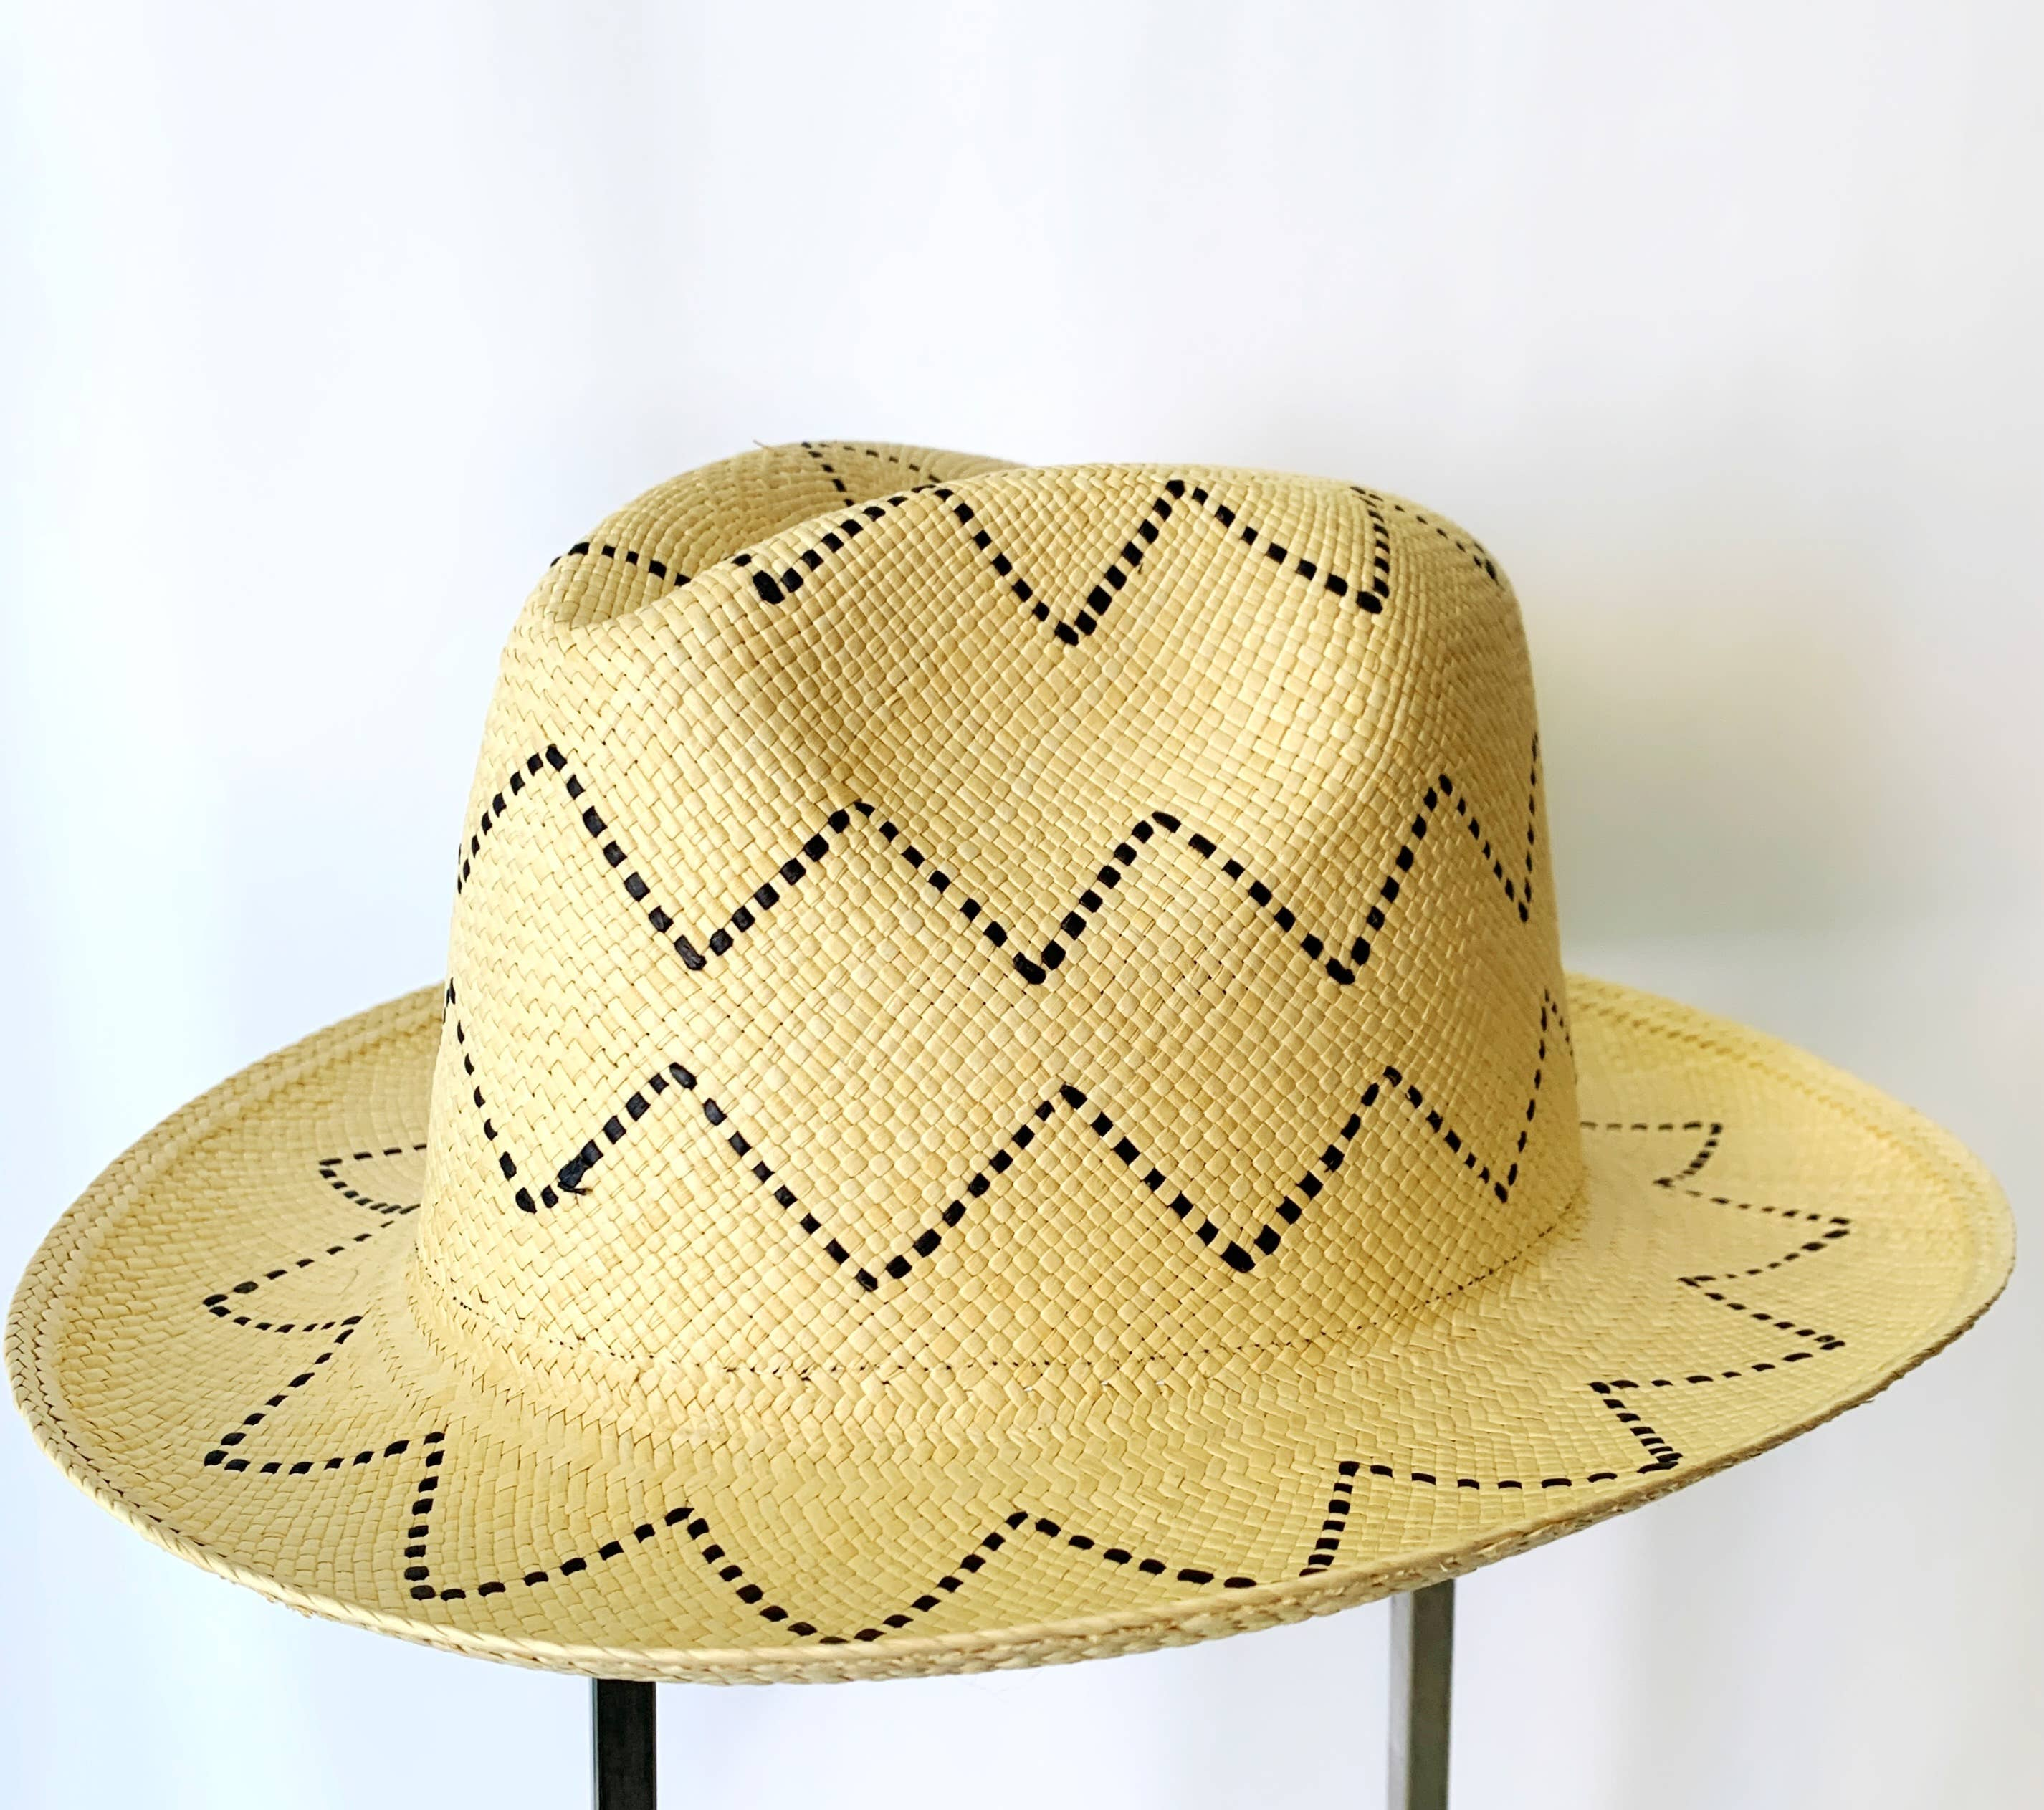 Lemloreli - Star Hat | Trada Marketplace